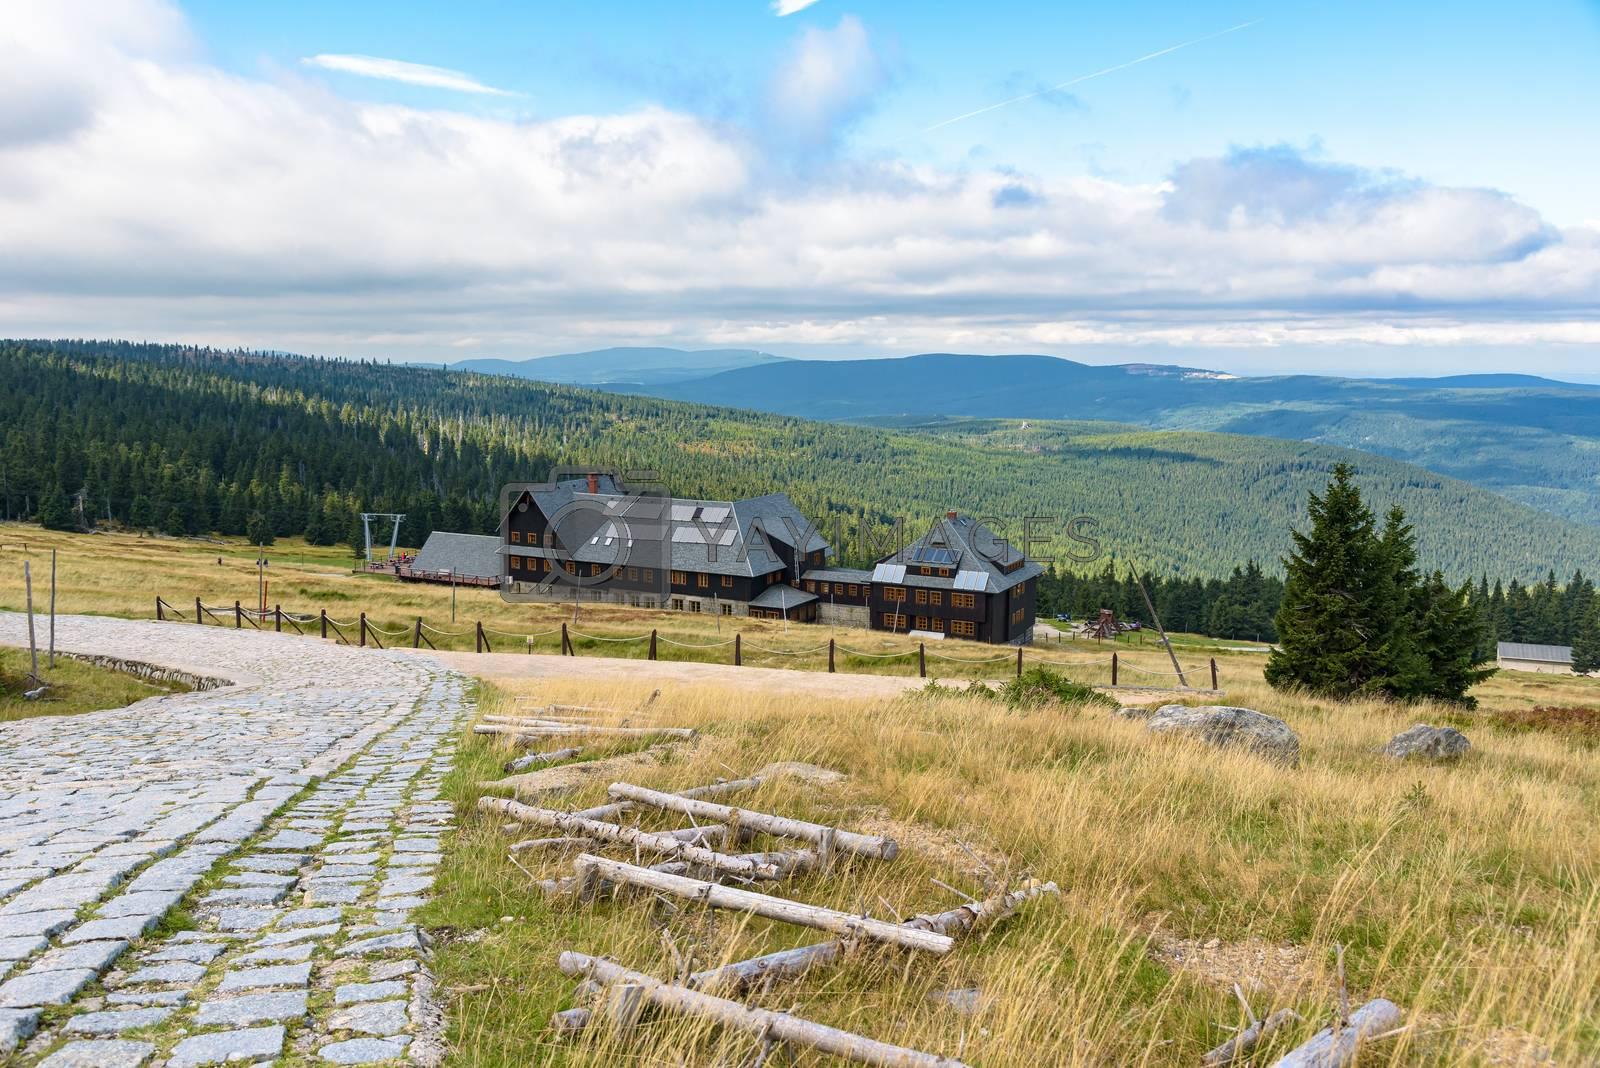 Summer view of mountain shelter at Hala Szrenicka in Giant Mountains near Szklarska Poreba in Poland